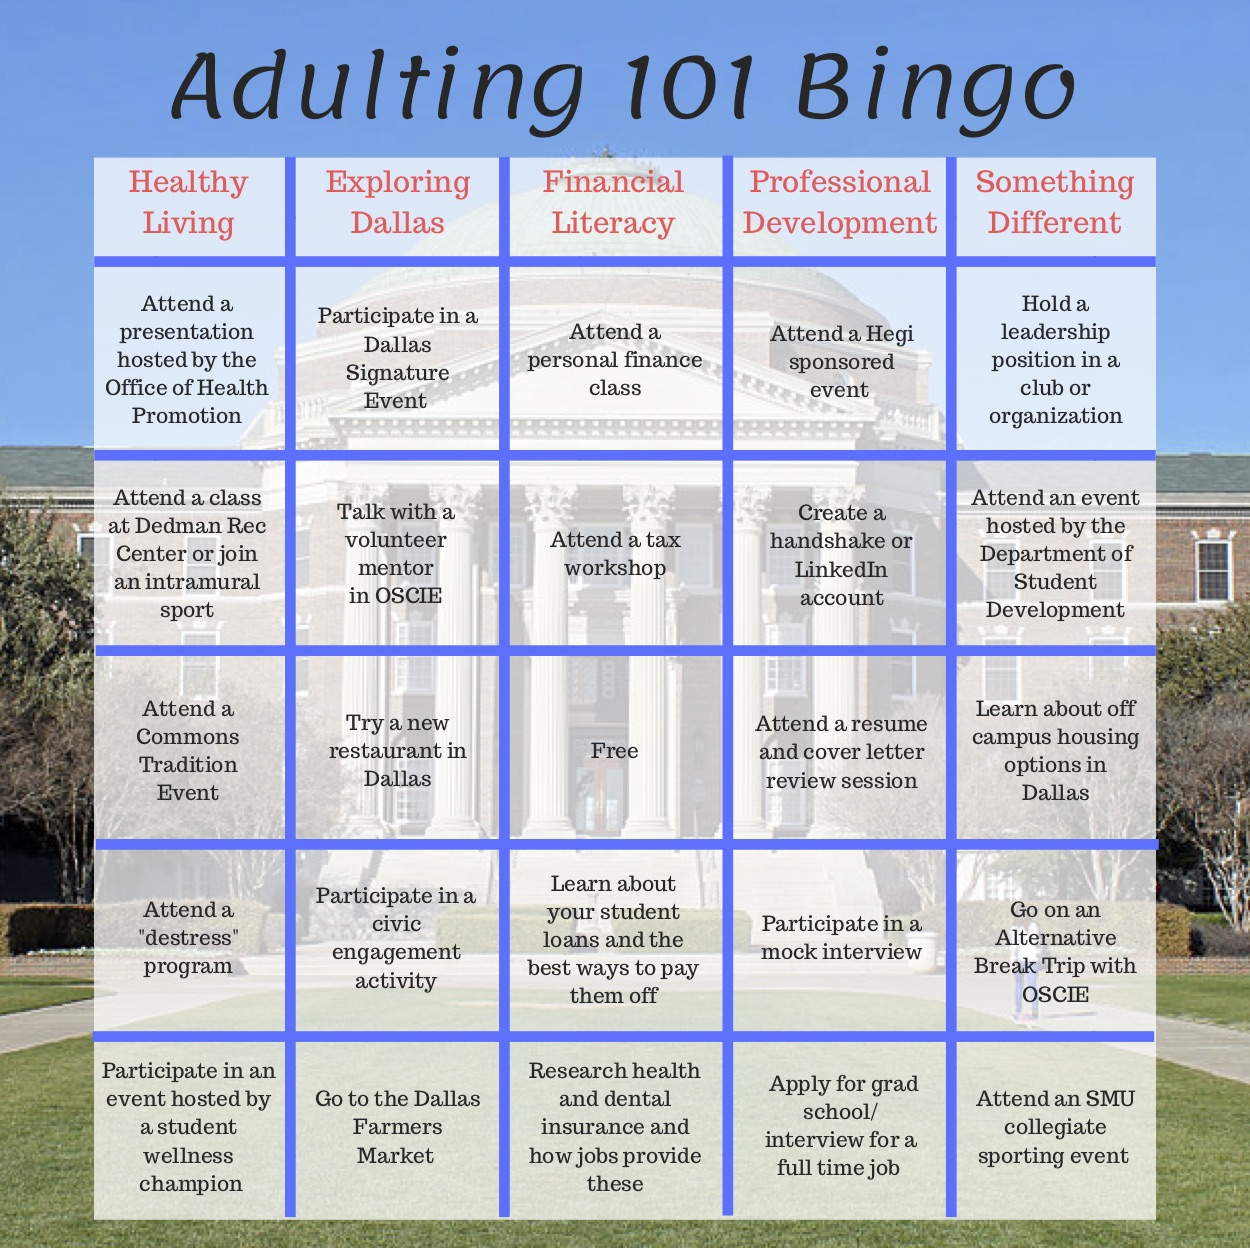 Adulting 101 Bingo (2) copy 2.jpg